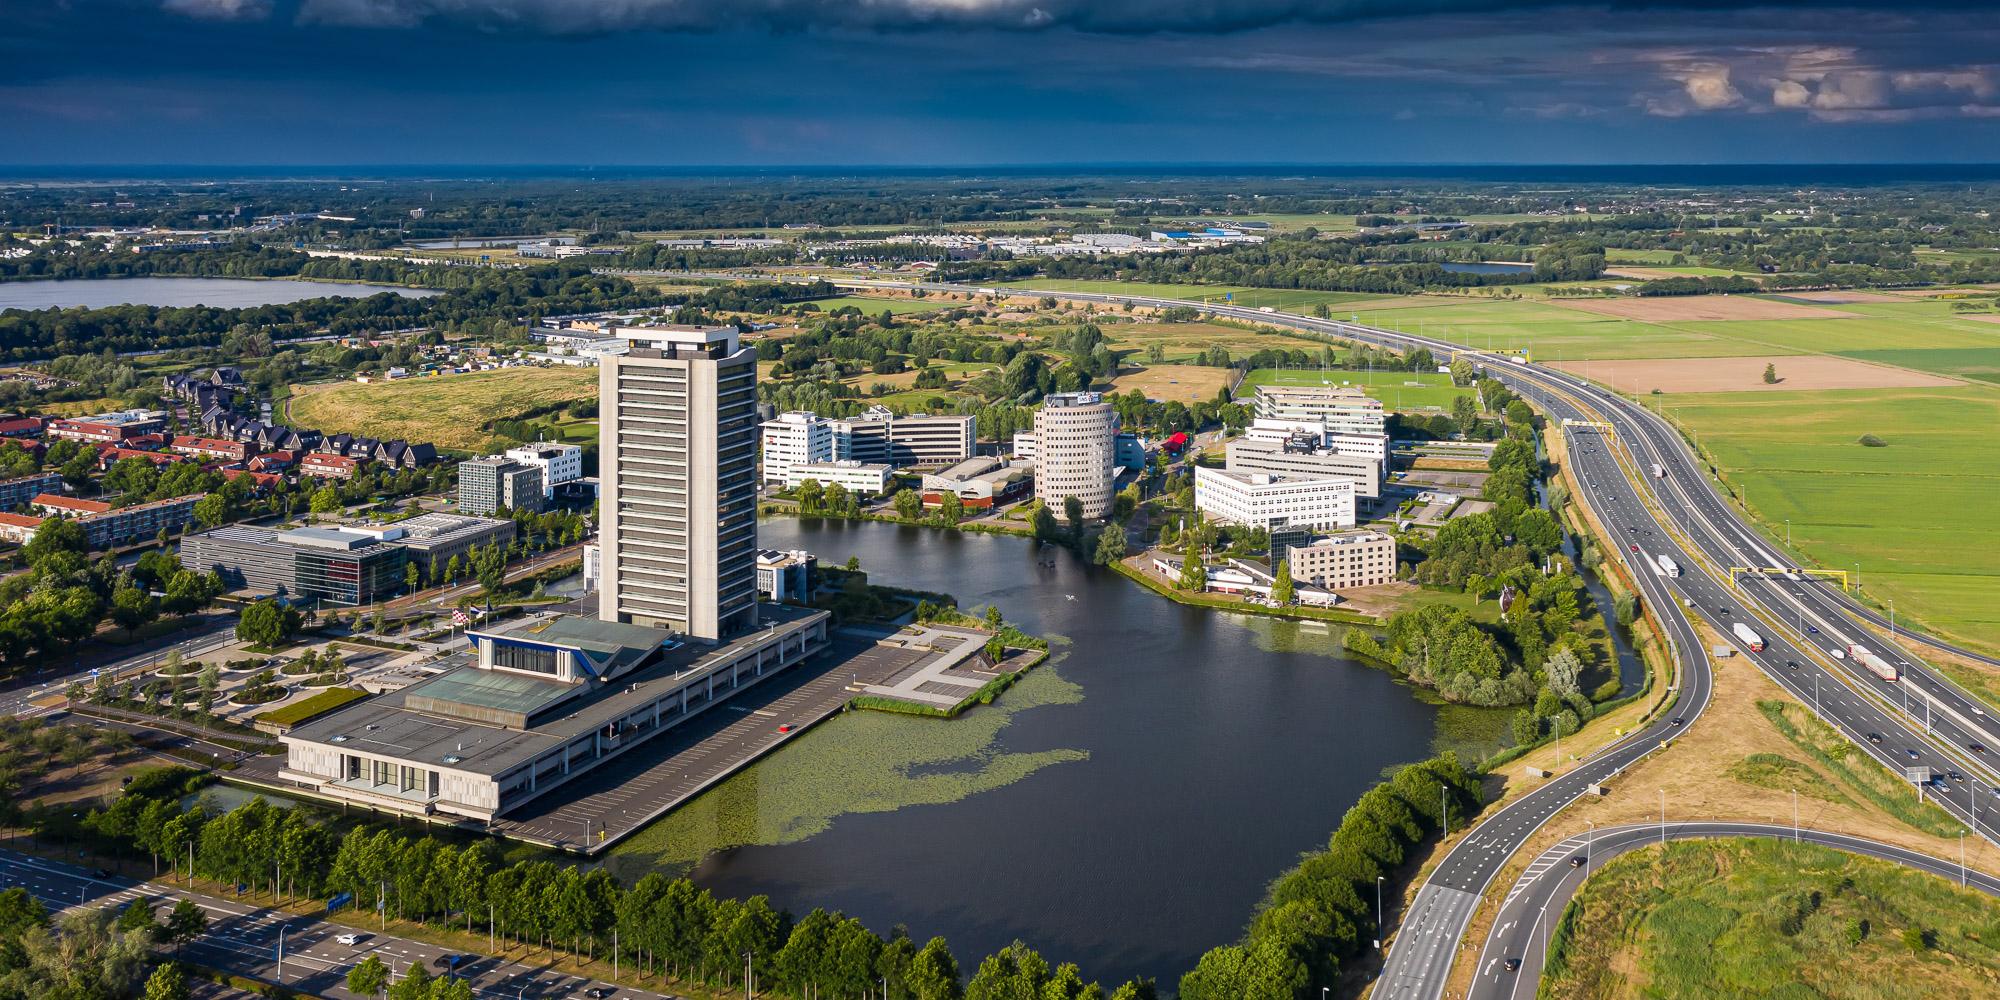 RPS tekent raamcontract met Provincie Noord-Brabant